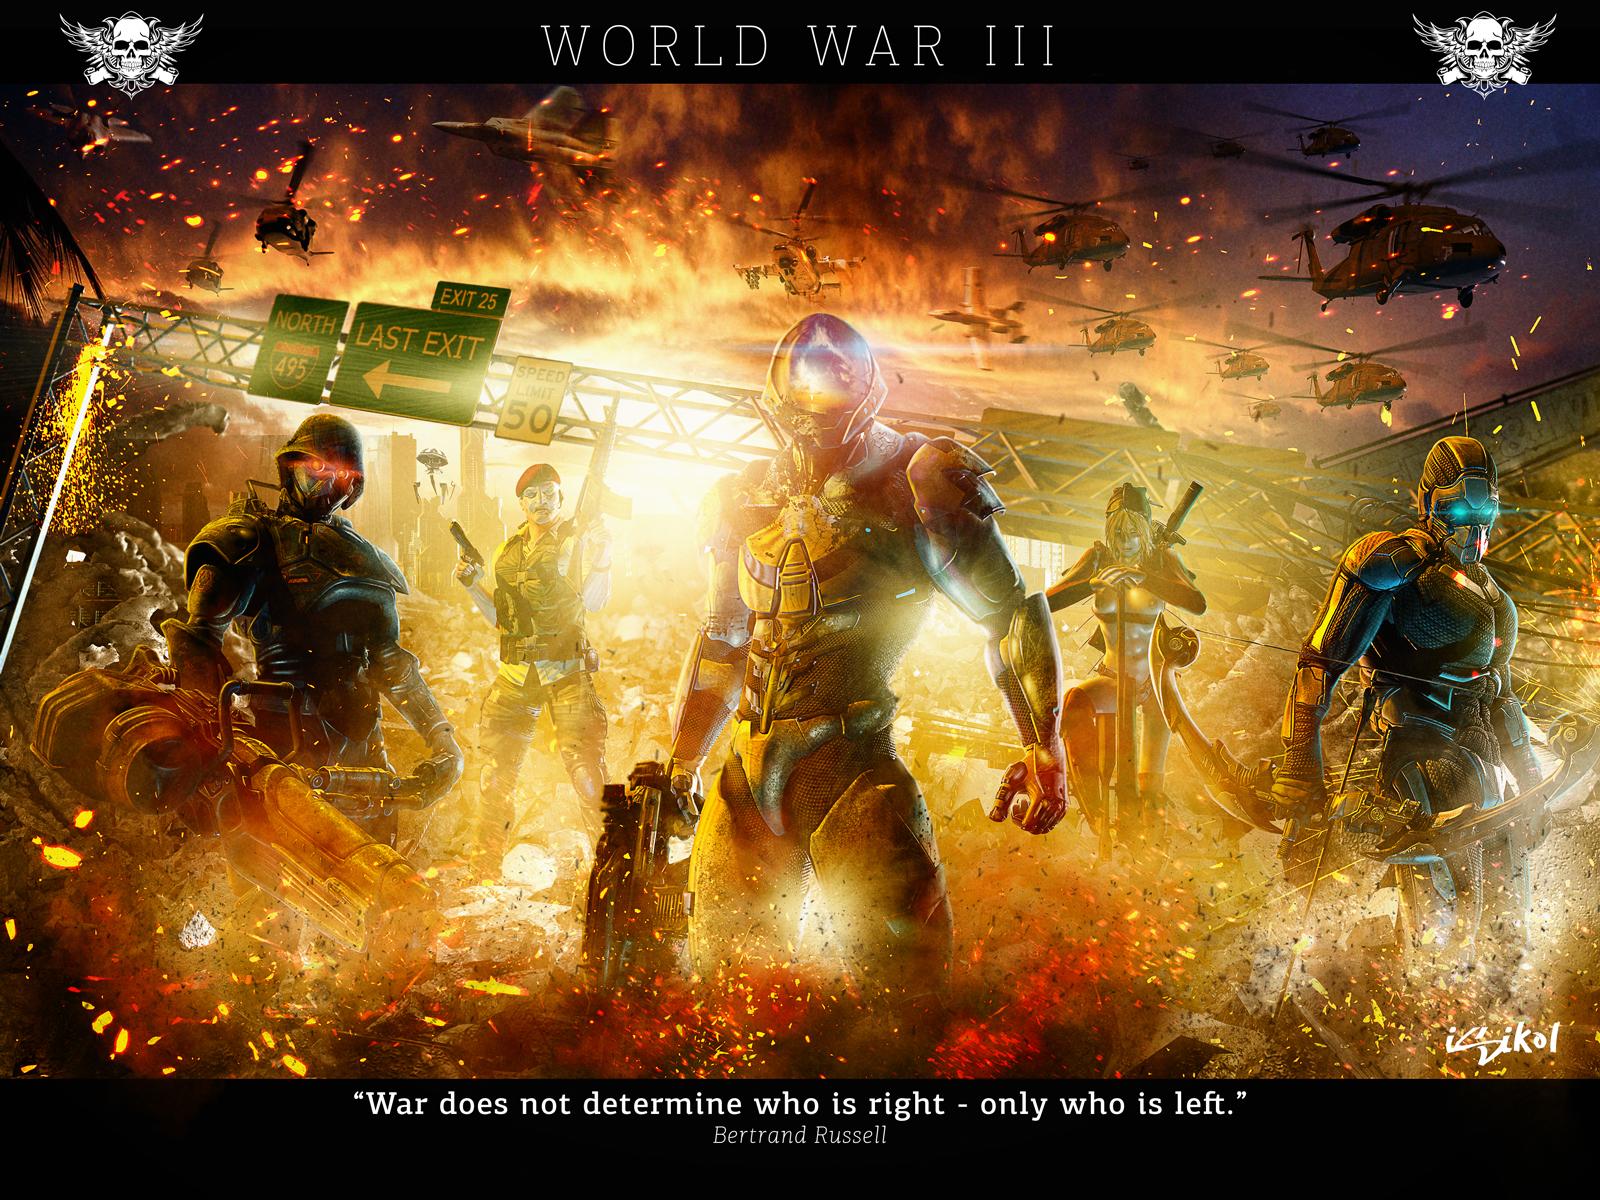 WORLD WAR III by isikol on DeviantArt